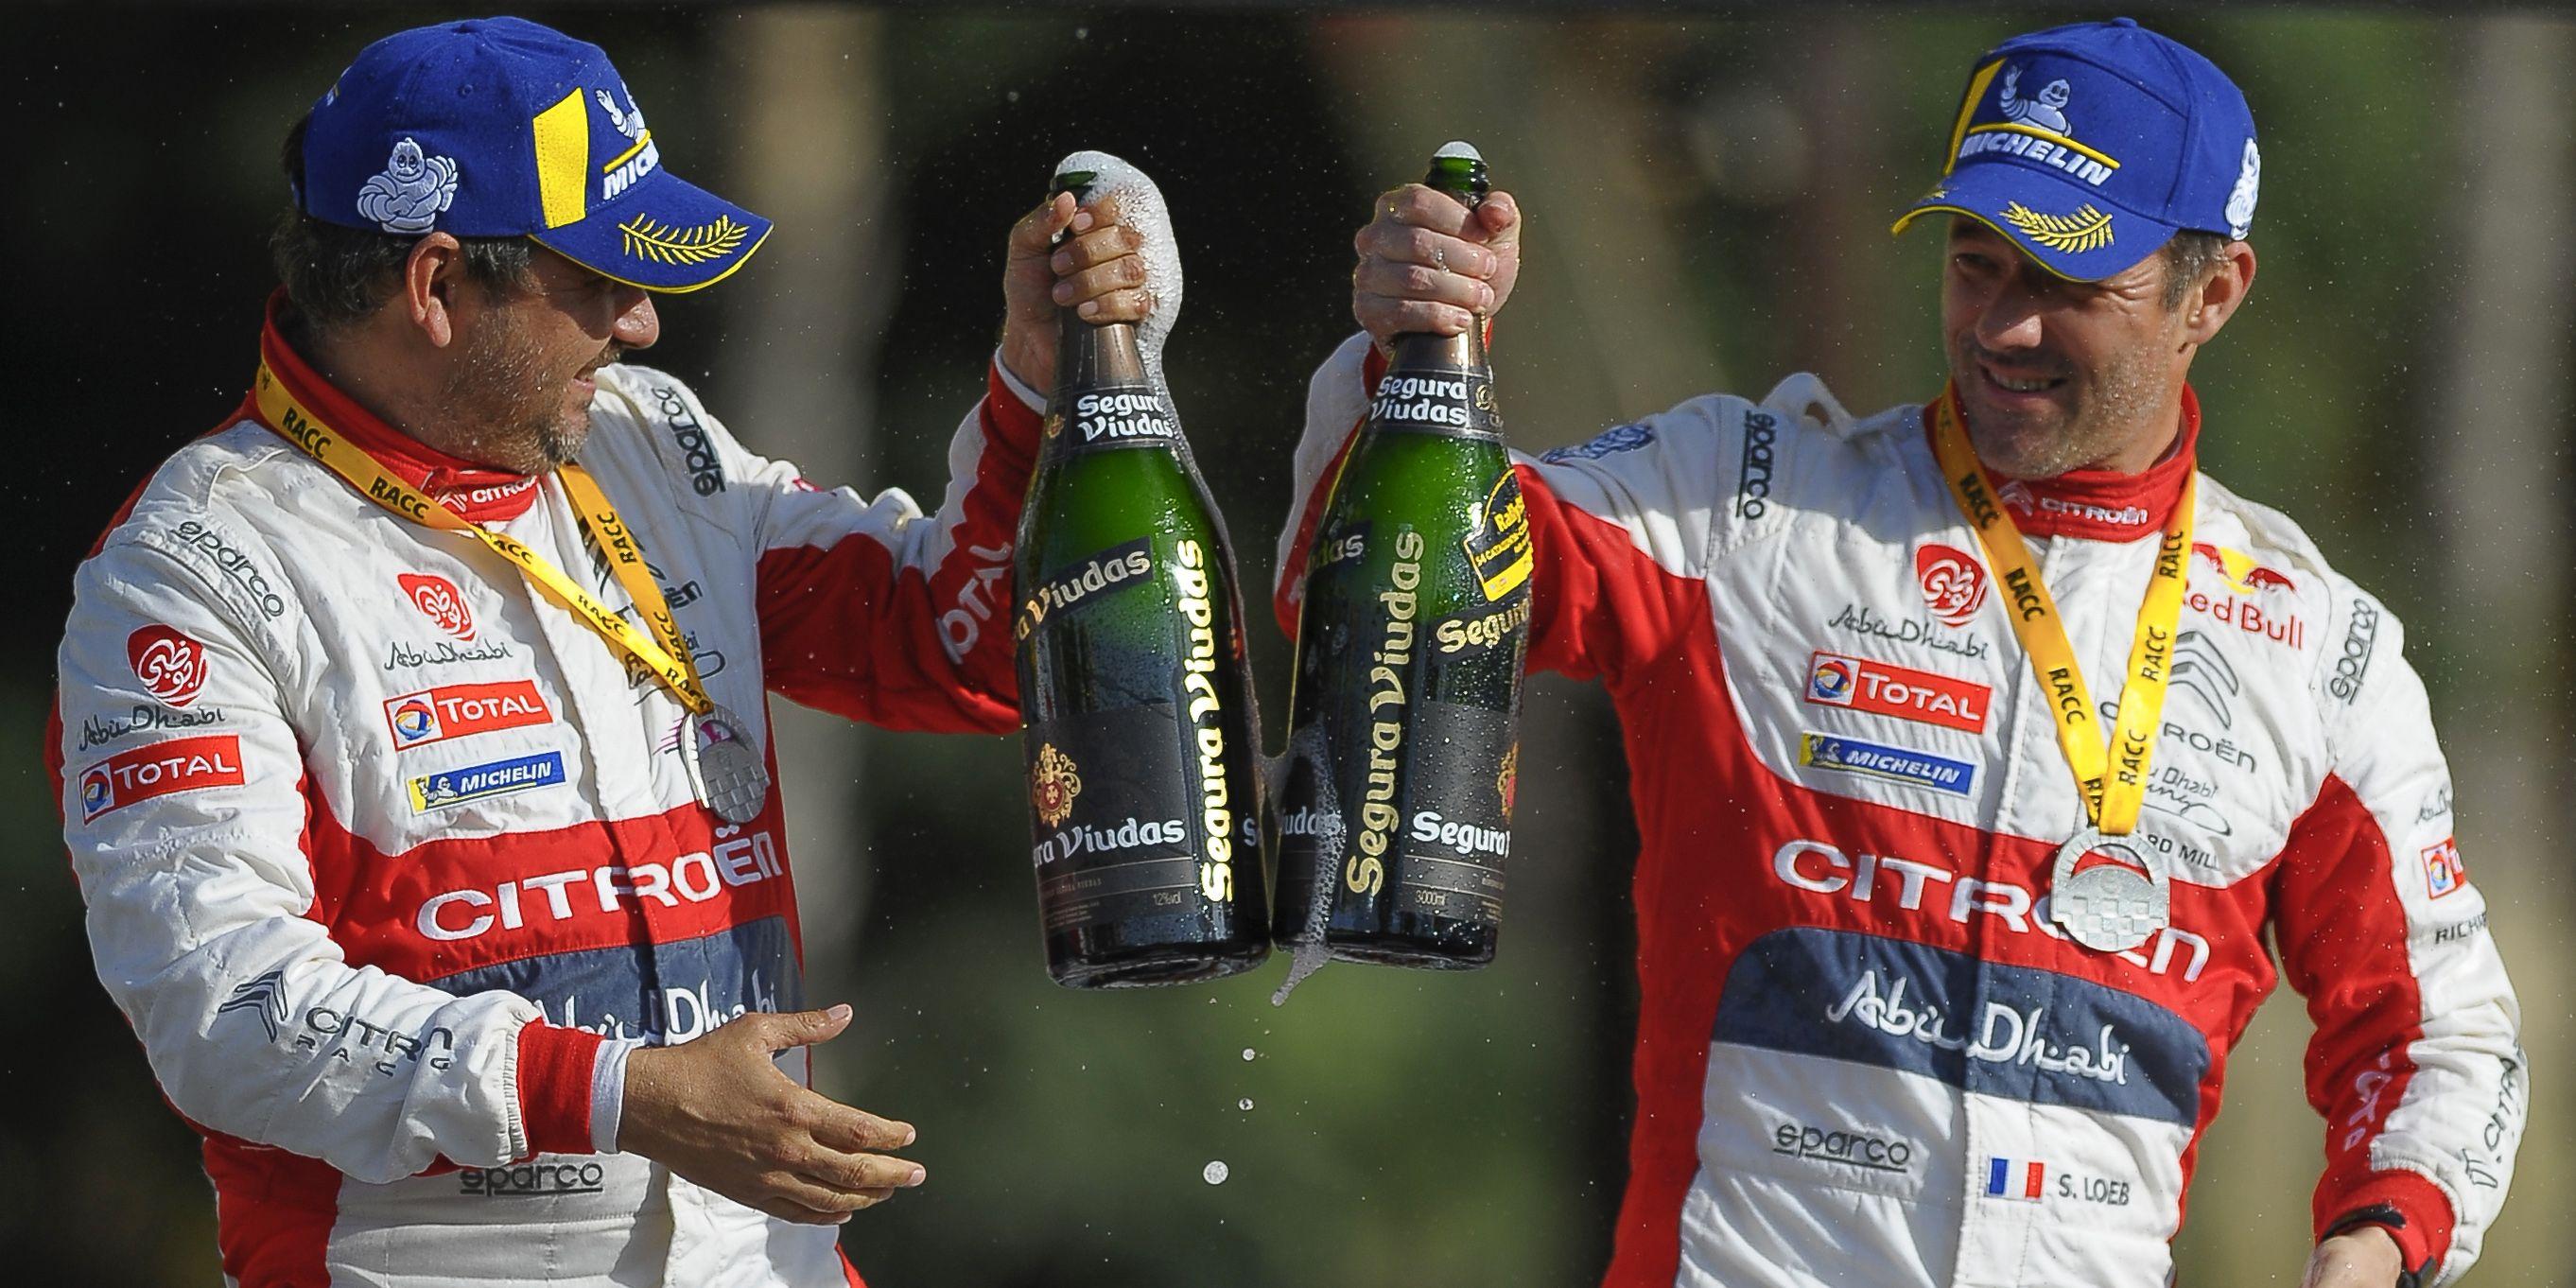 Rally Catalunya WRC Podium Ceremony